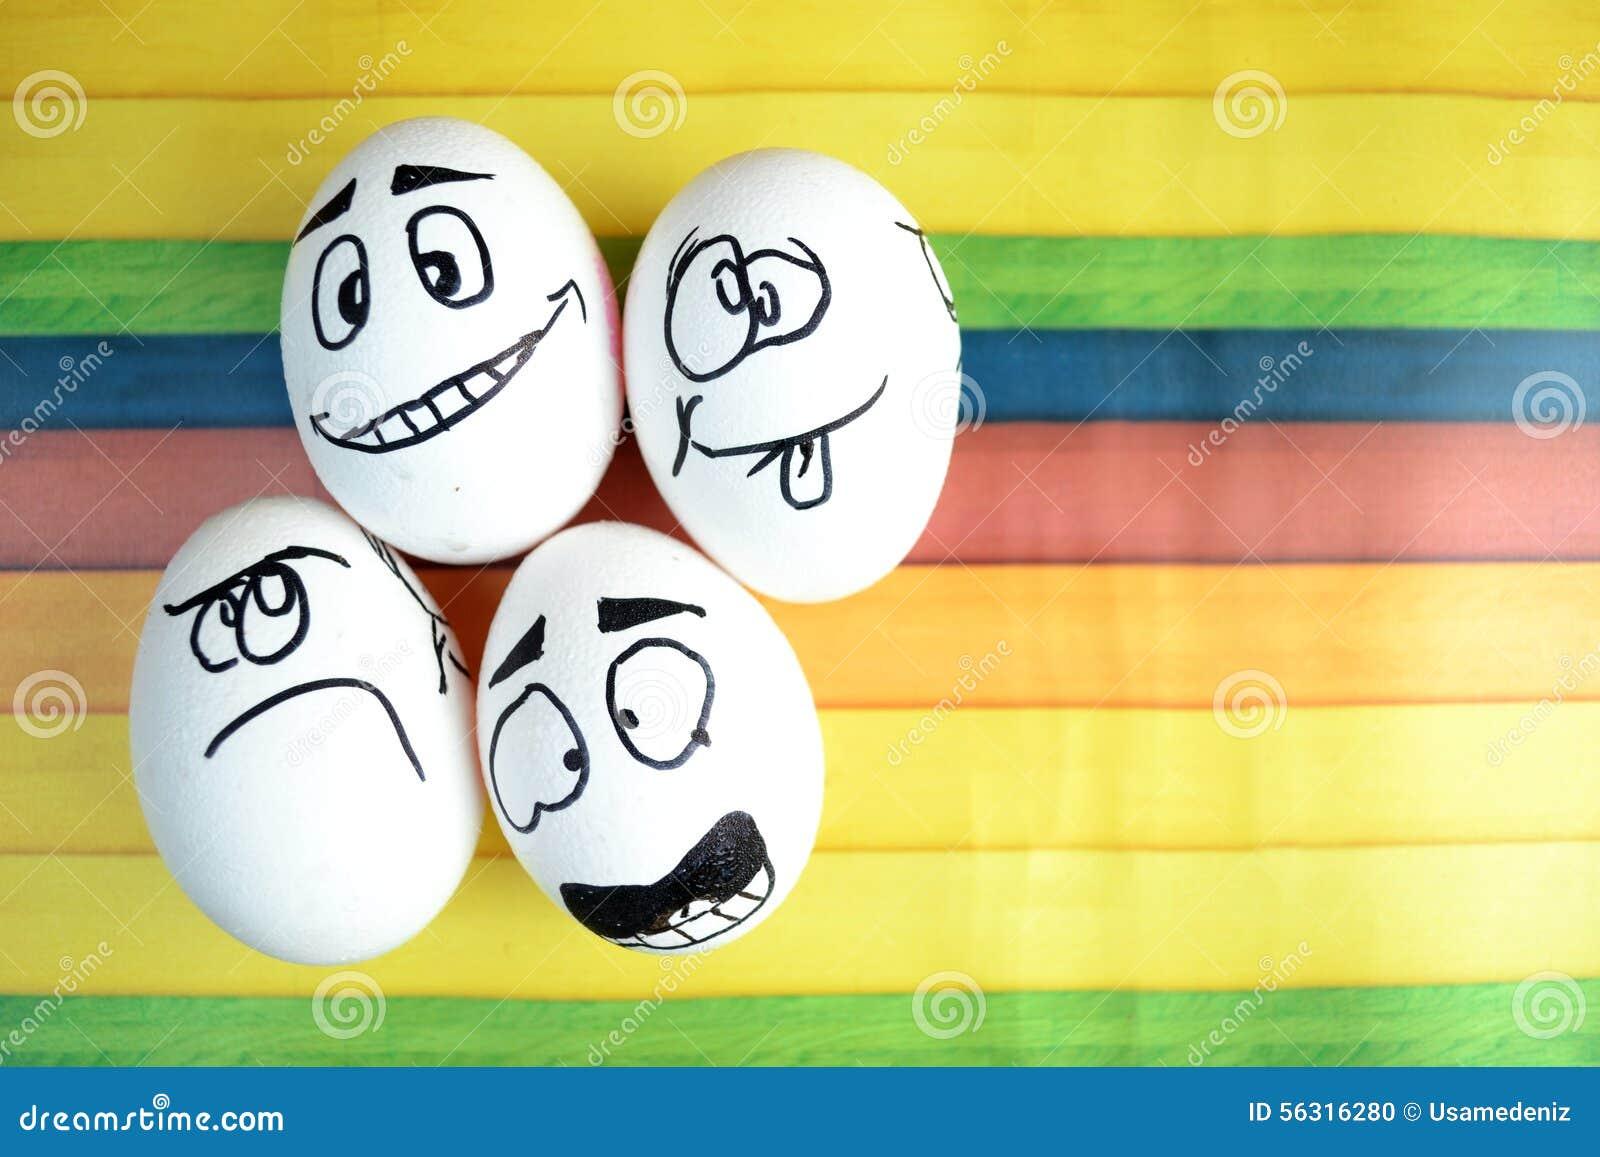 lustige eier stock abbildung bild 56316280. Black Bedroom Furniture Sets. Home Design Ideas